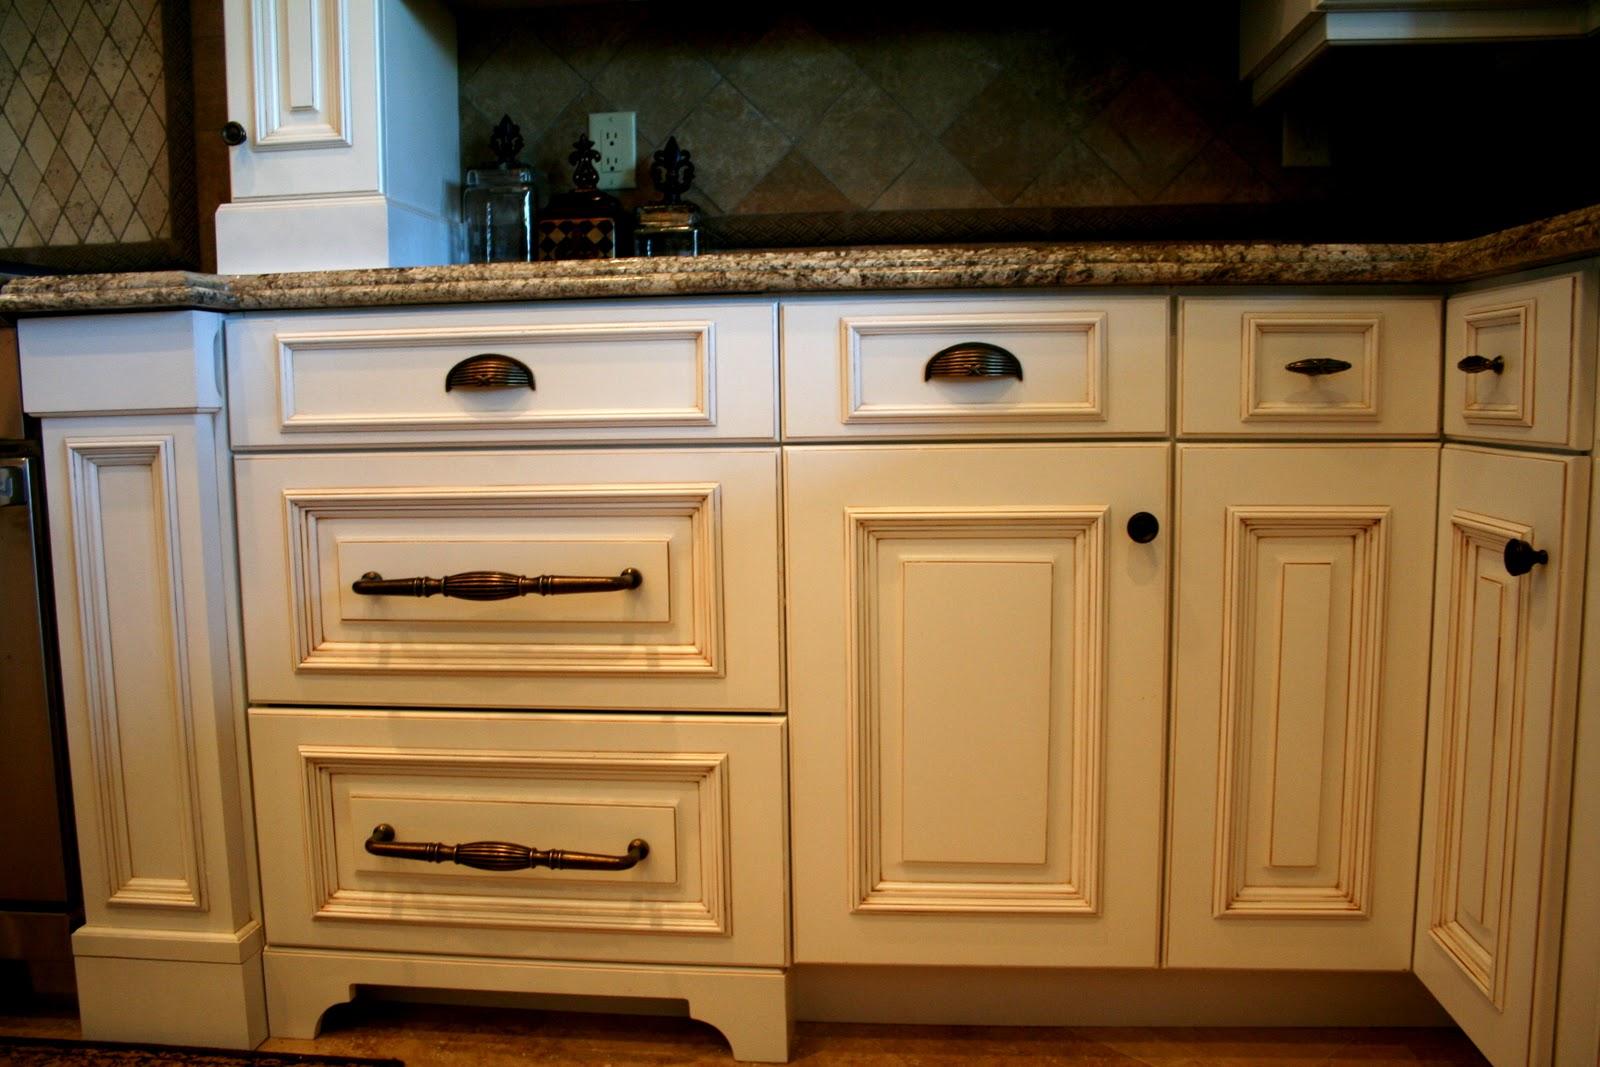 kitchen cabinets door knobs kitchen cabinet door pulls Cabinet Hardware